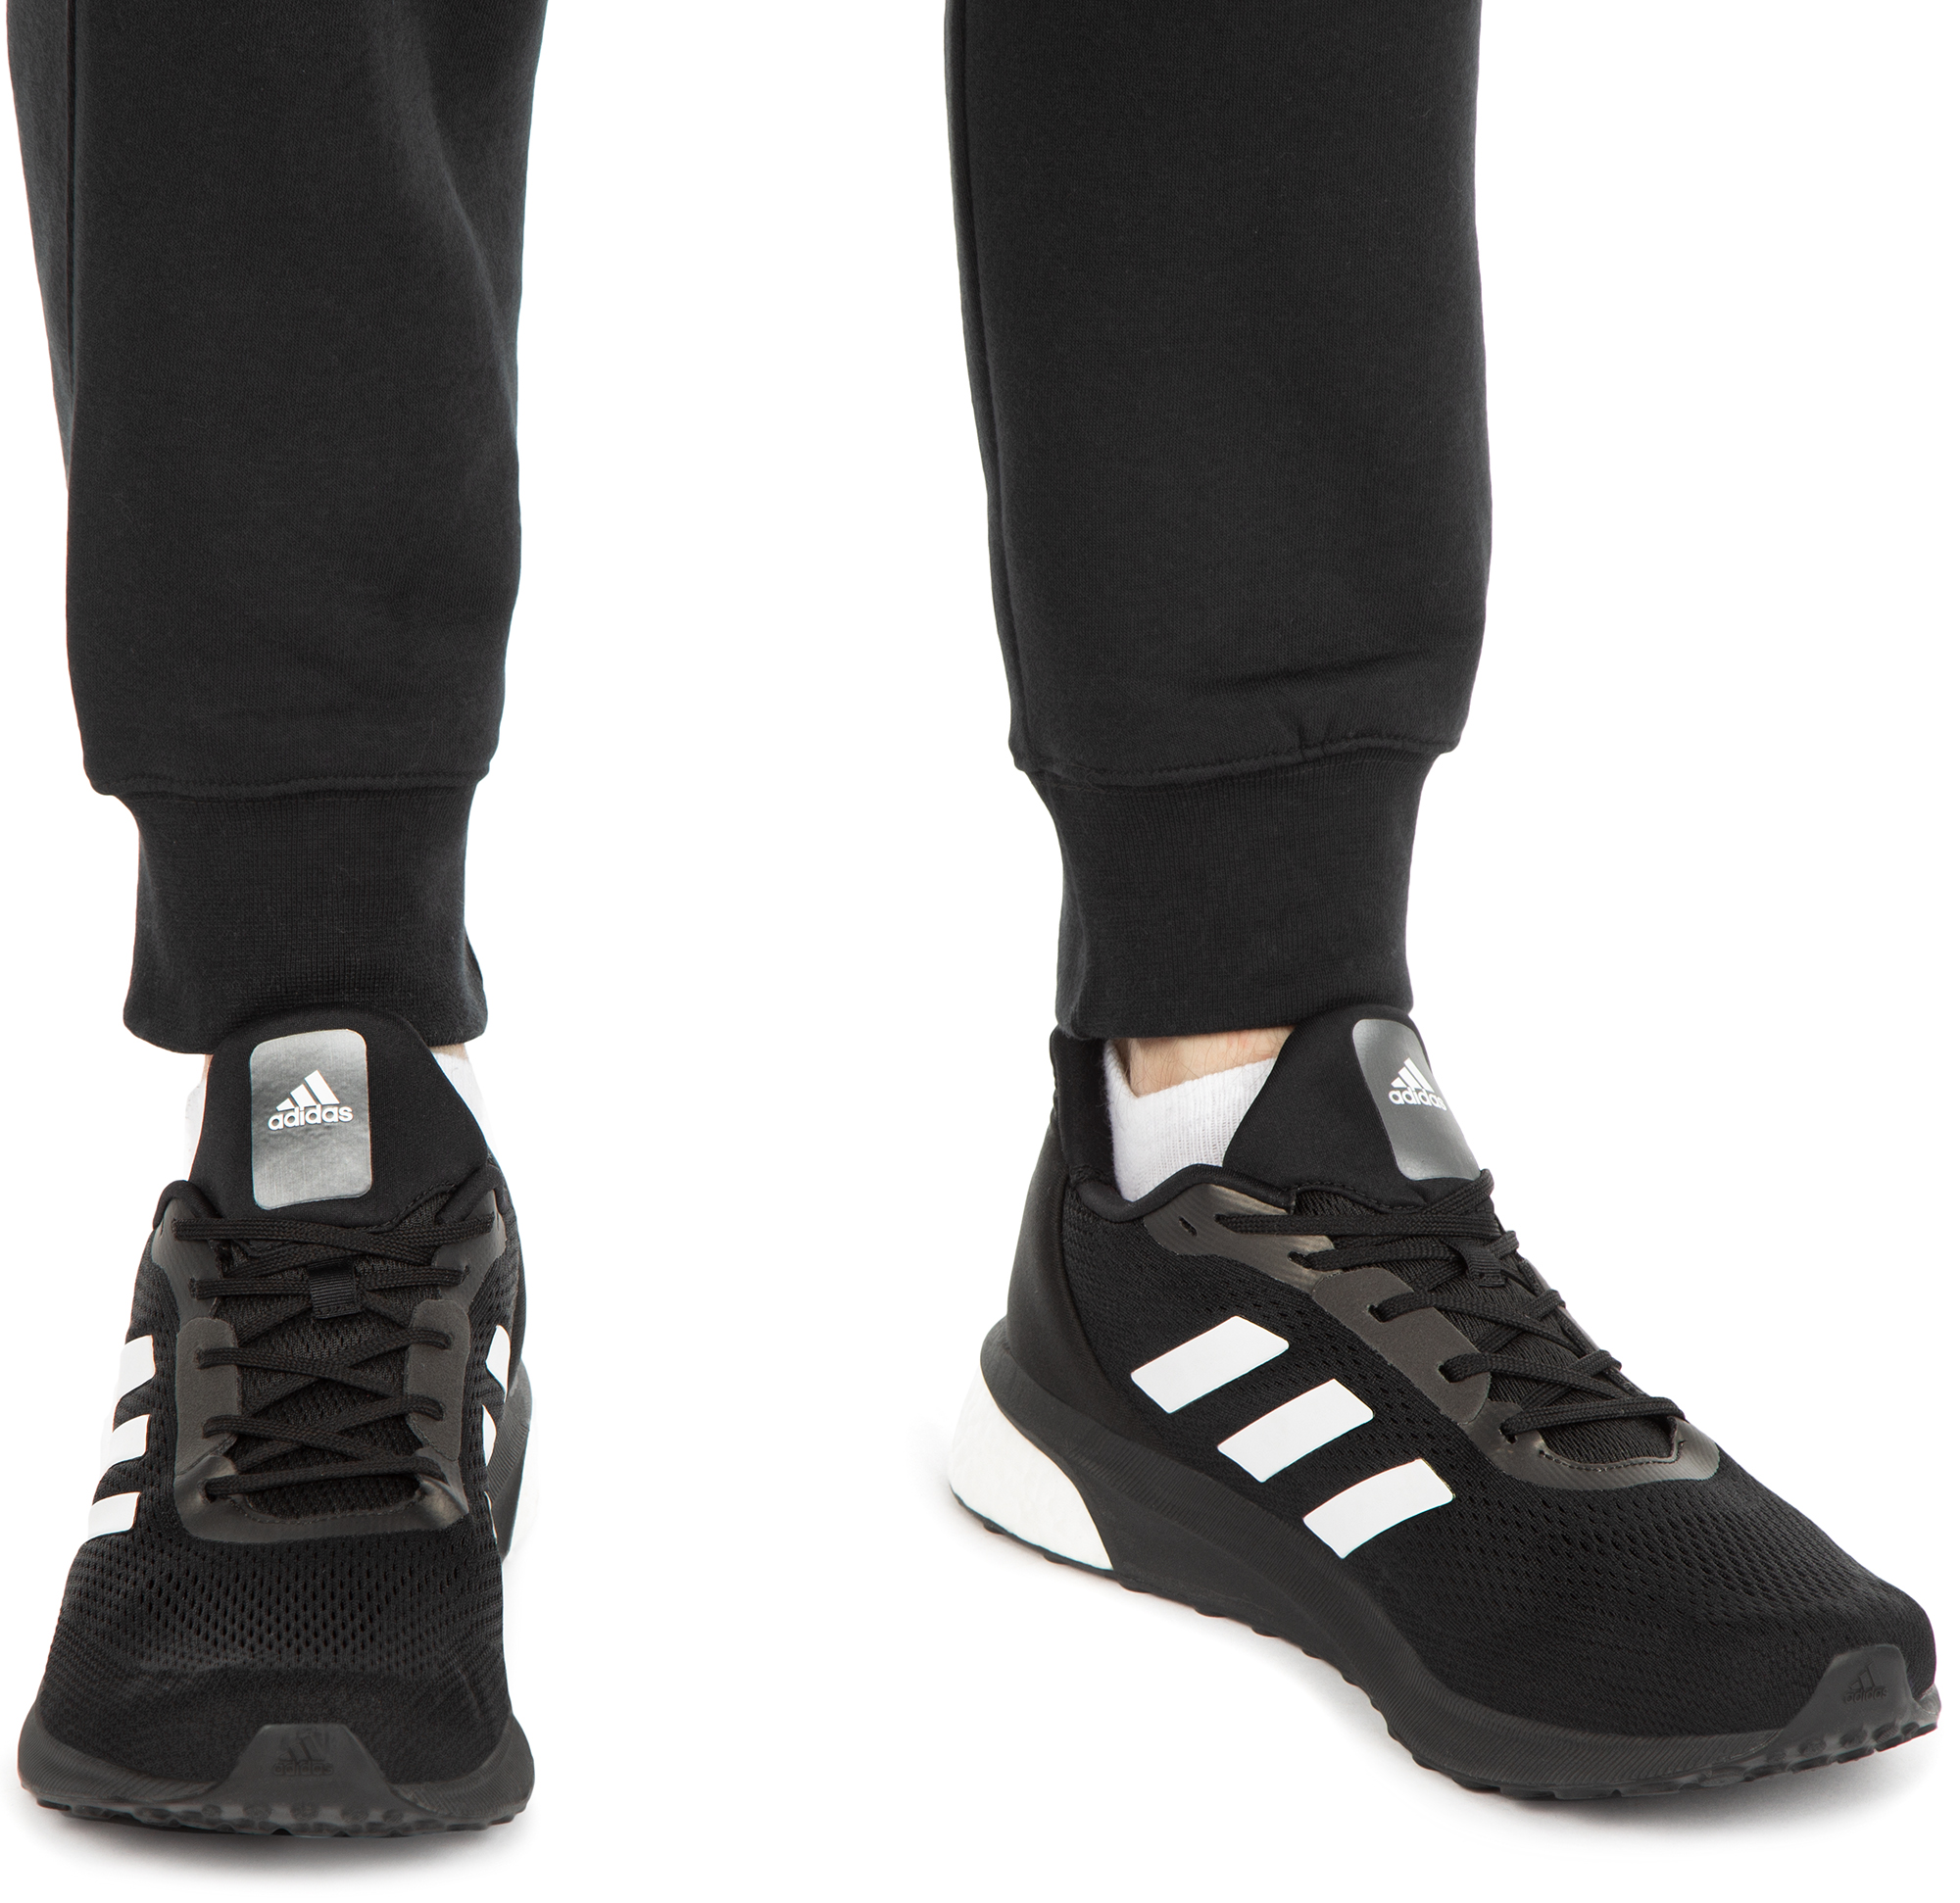 Adidas Кроссовки мужские Adidas Astrarun, размер 44,5 цена